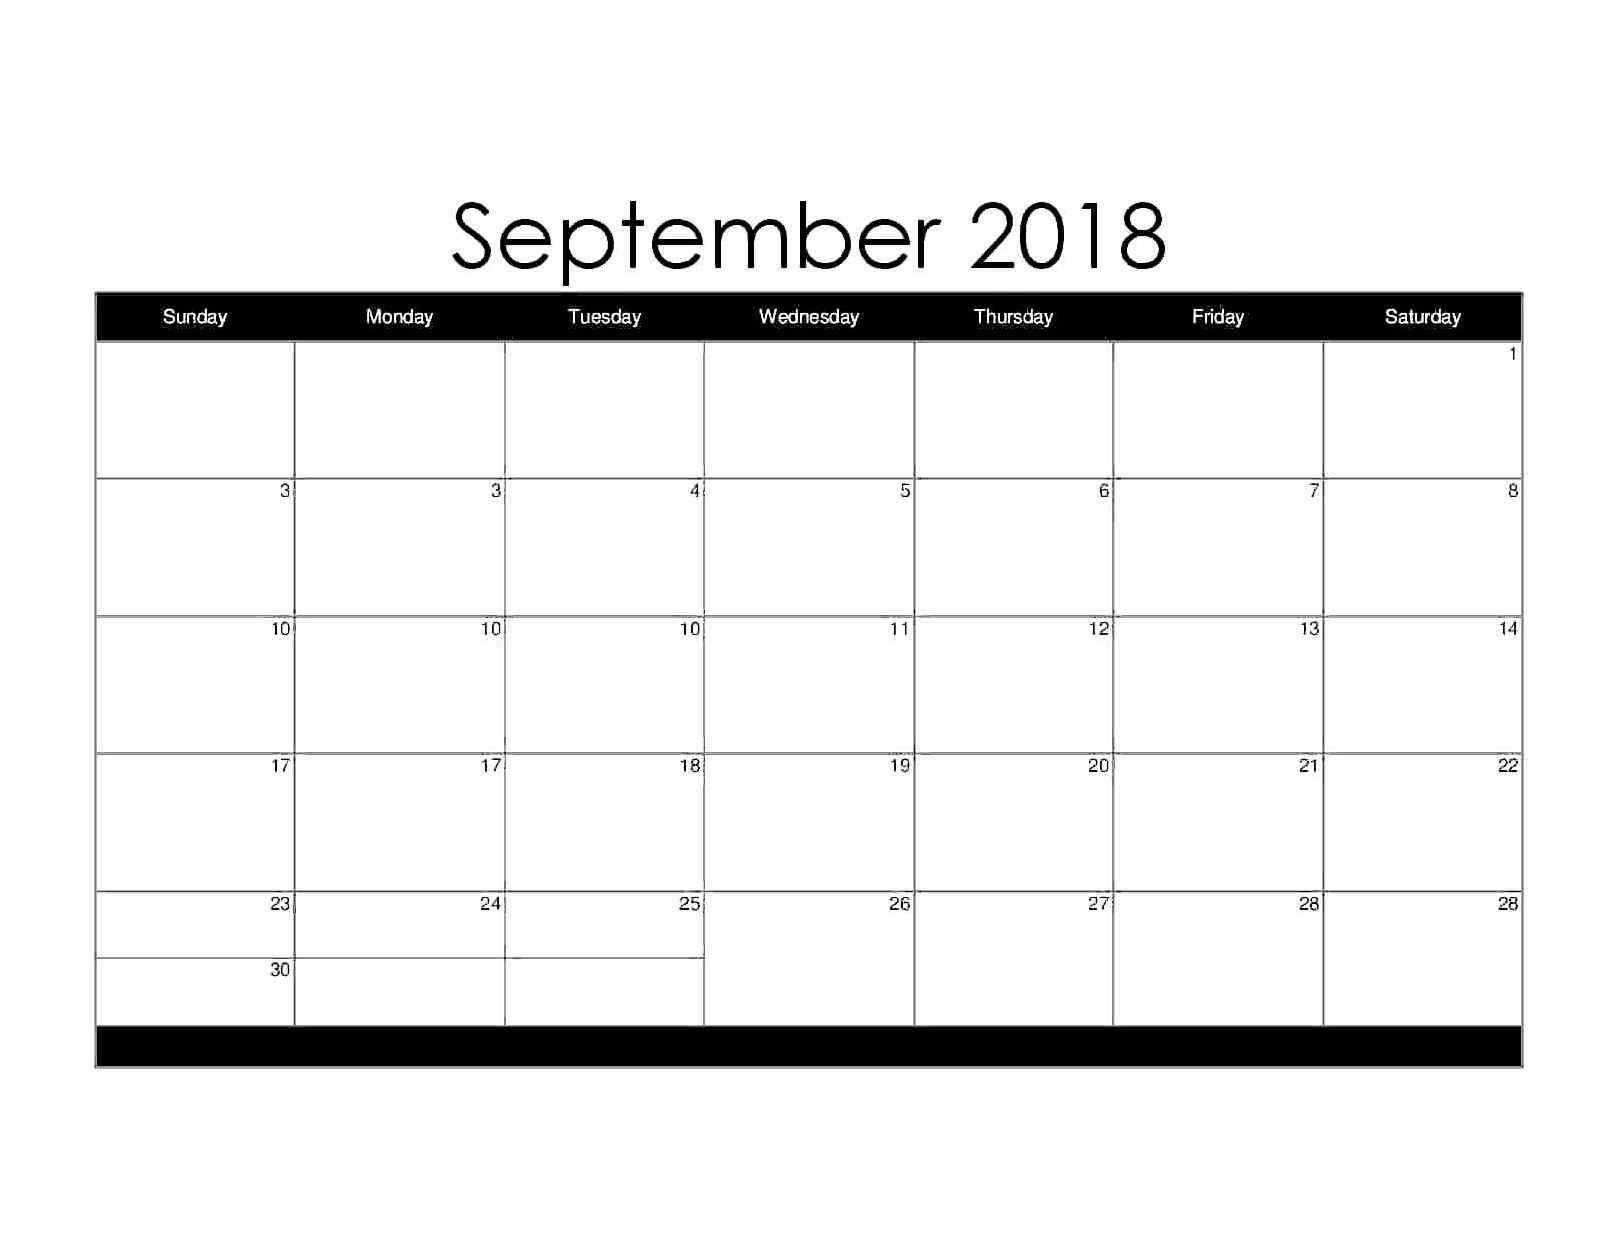 September Month Calendar 2018 Start With Monday regarding Blank Monthly Calendar September